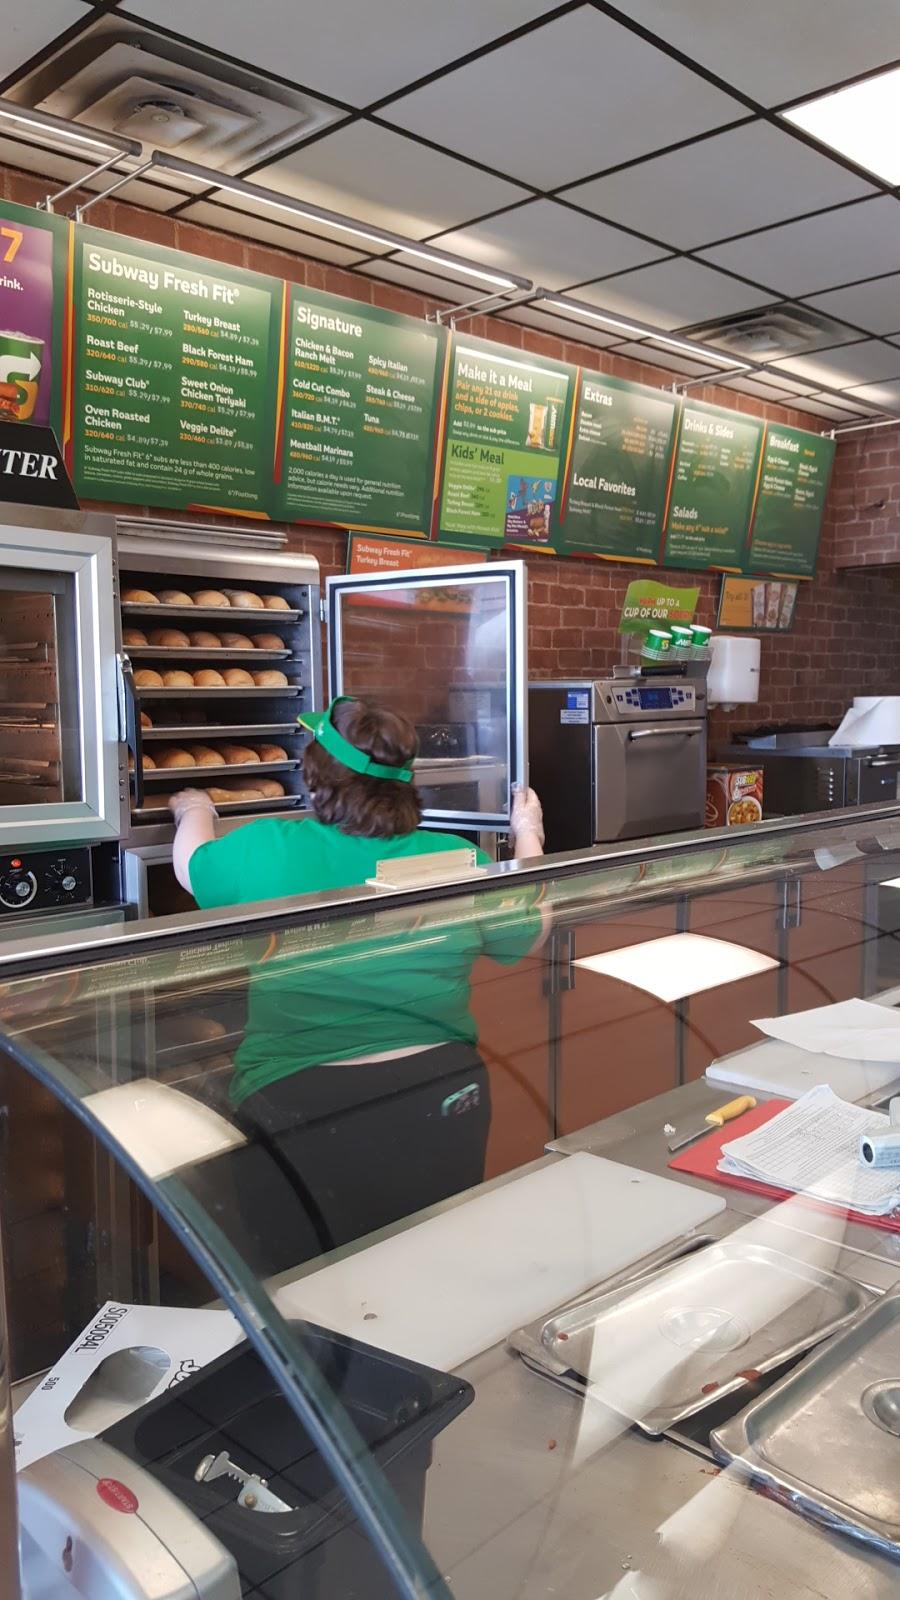 Subway Restaurants - restaurant    Photo 10 of 10   Address: 109 W Ovilla Rd, Red Oak, TX 75154, USA   Phone: (972) 230-7850